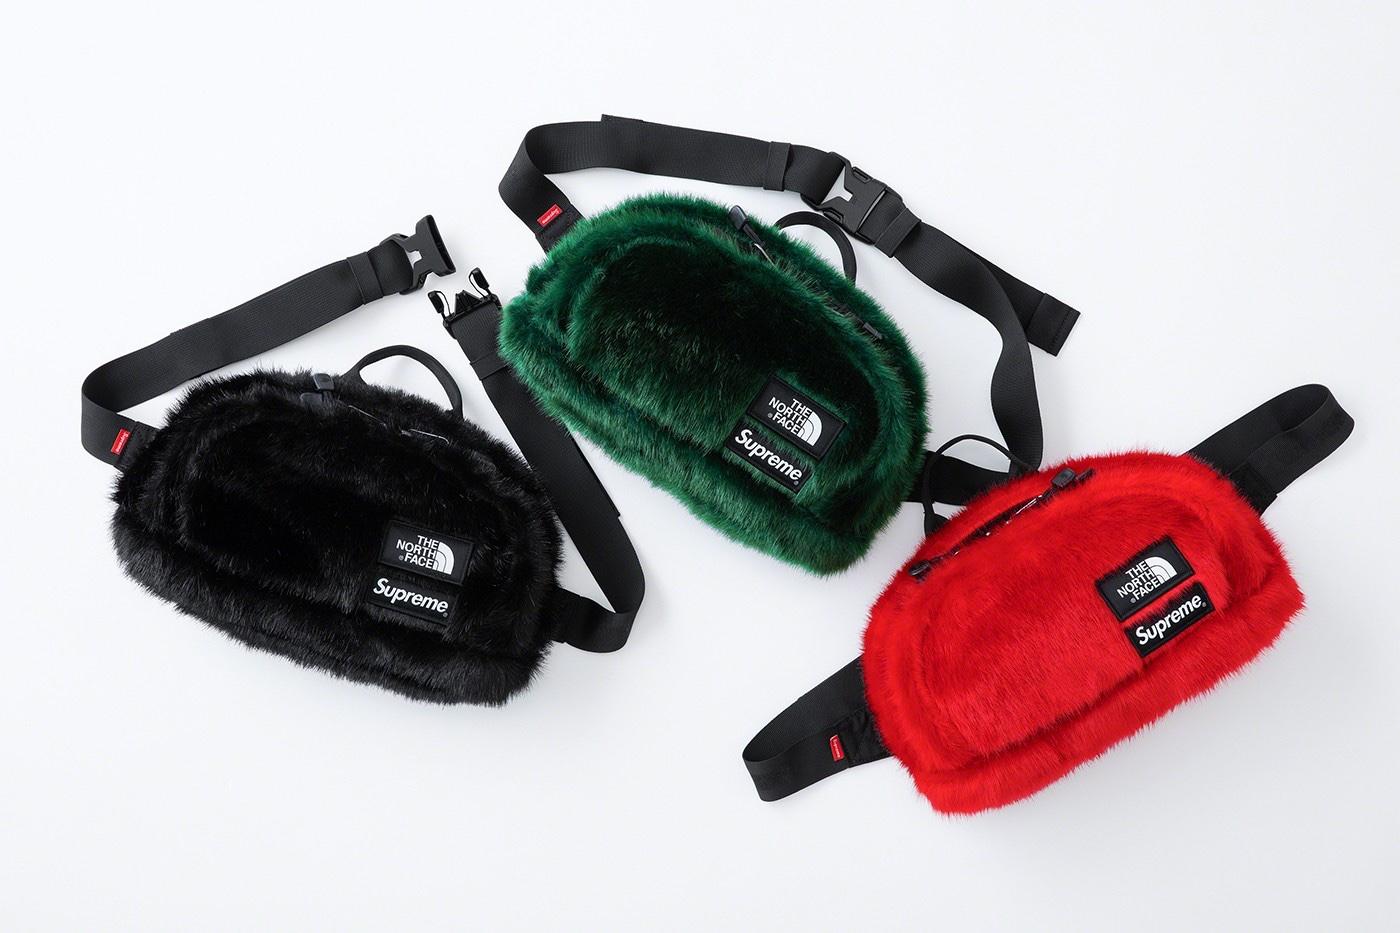 Supreme x The North Face Waist Bag 3L